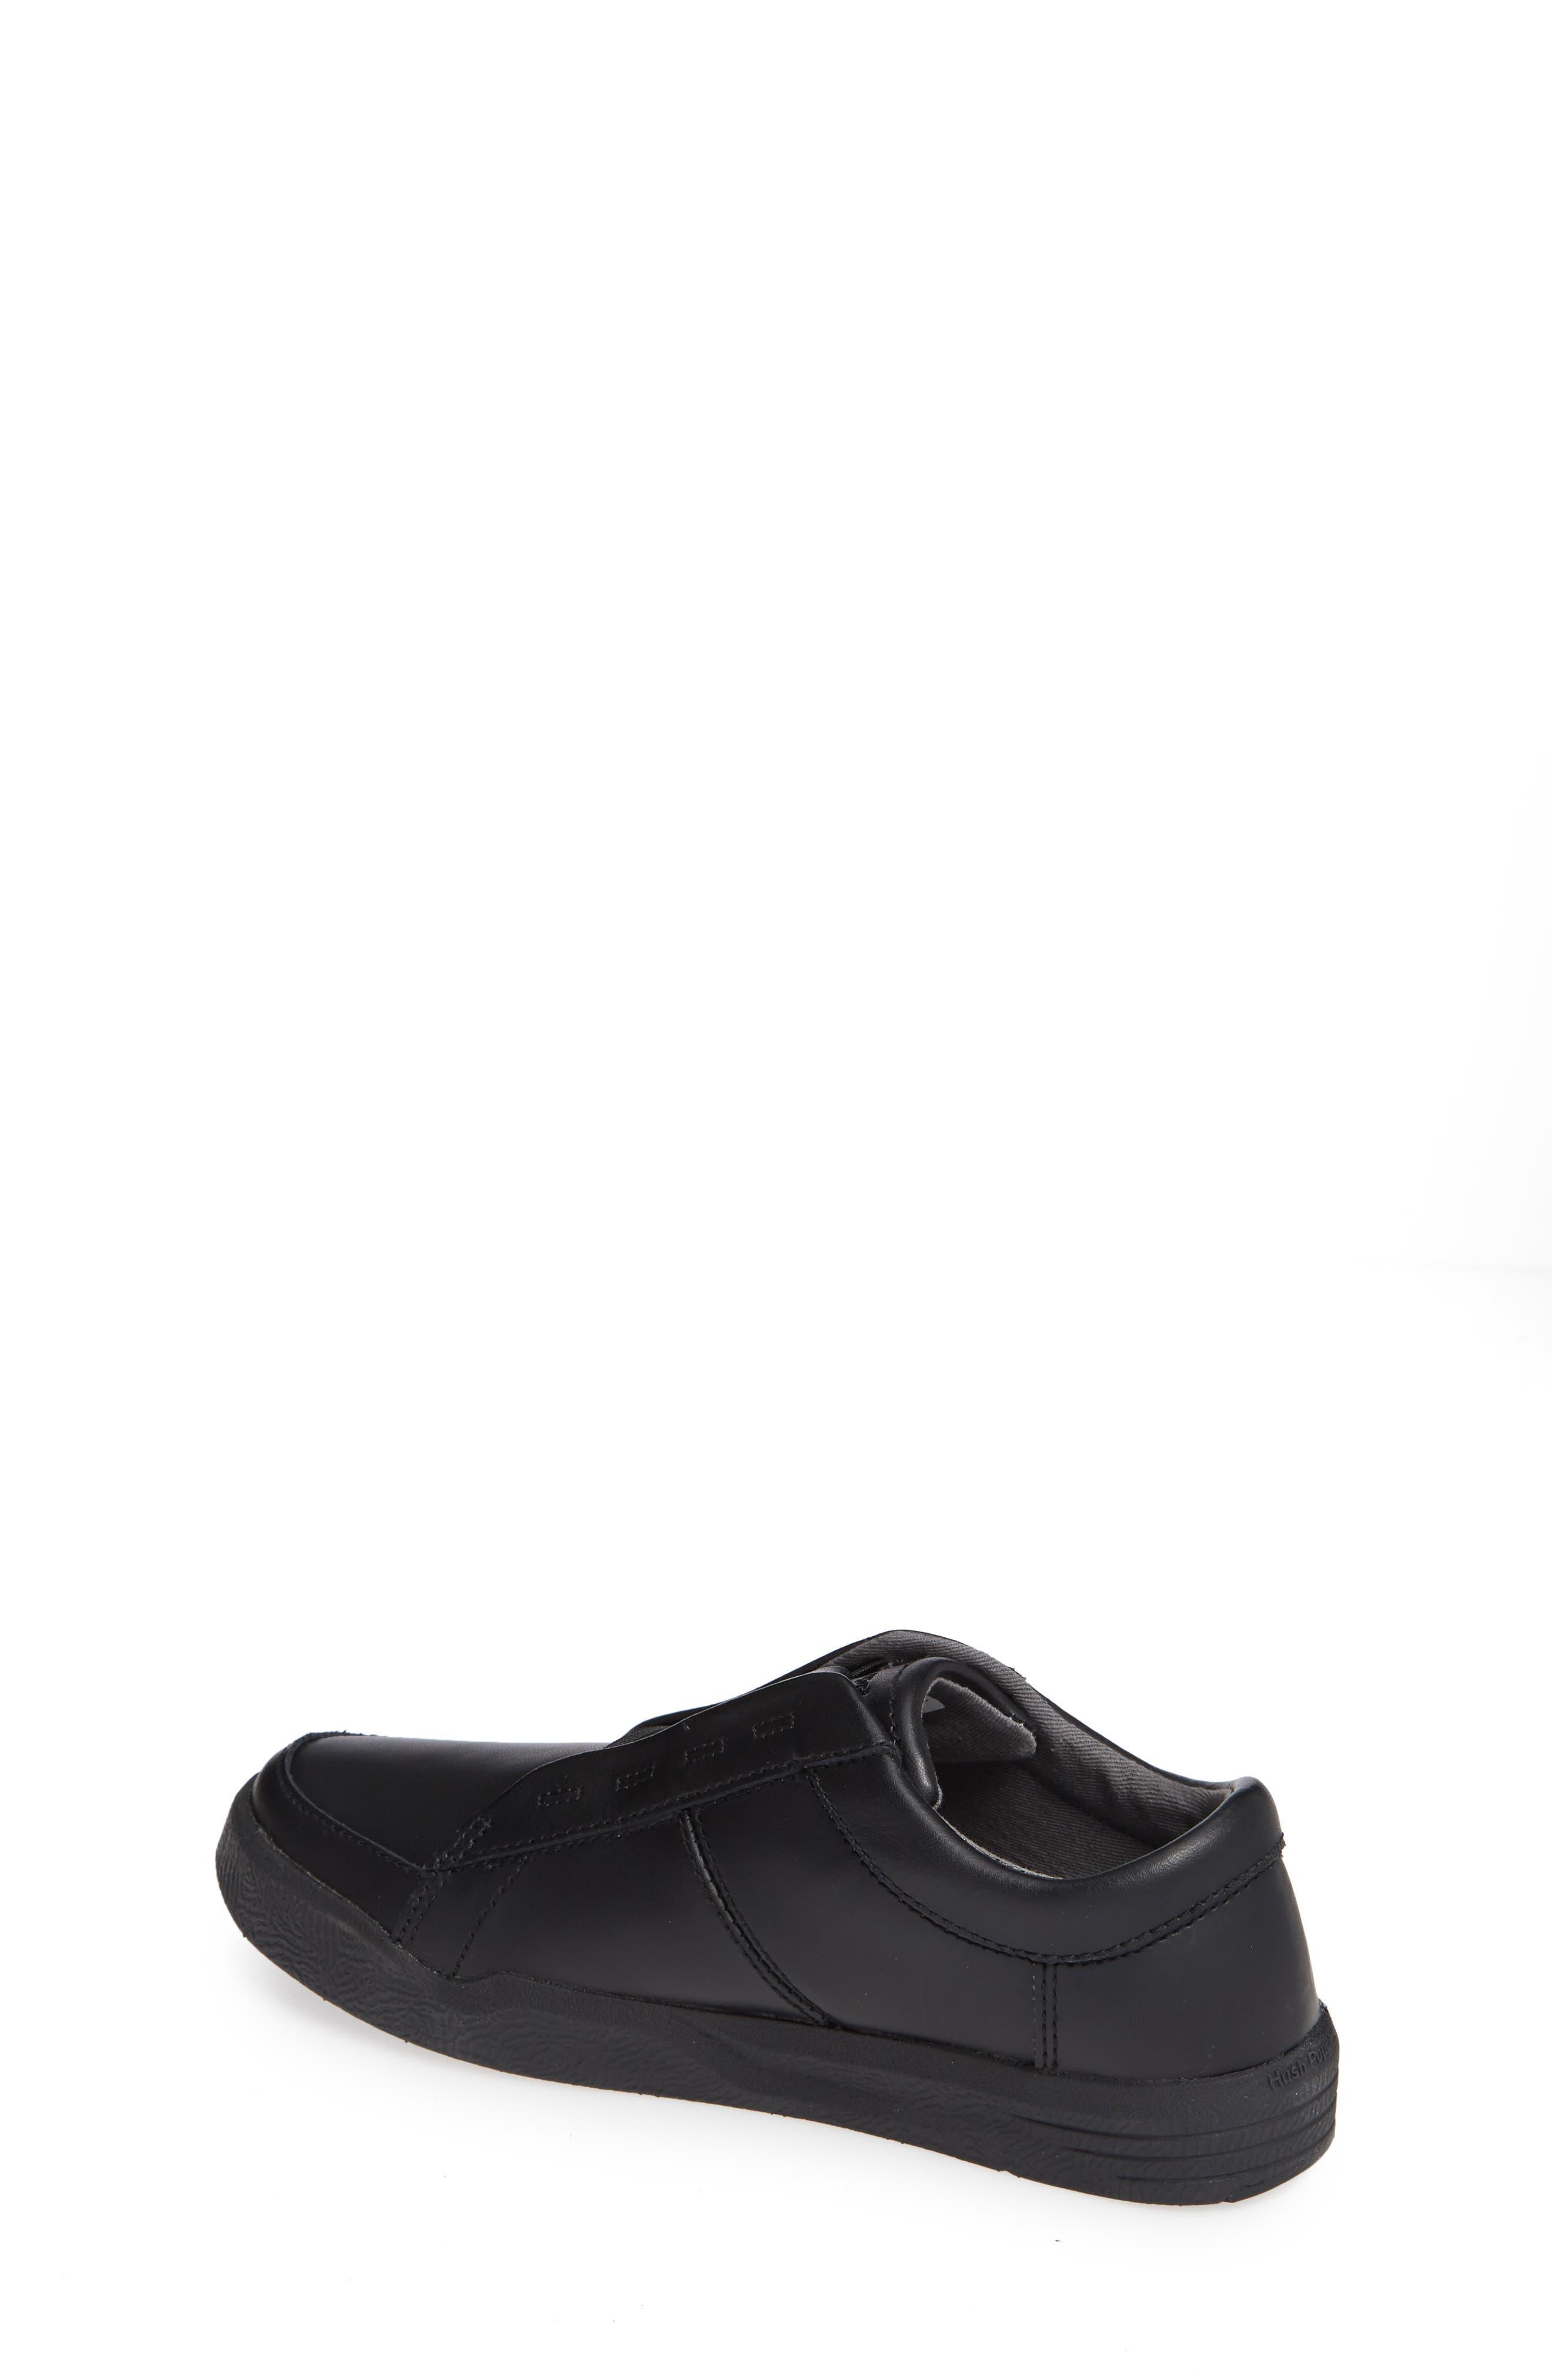 Layden Genius Leather Sneaker,                             Alternate thumbnail 2, color,                             BLACK/ BLACK